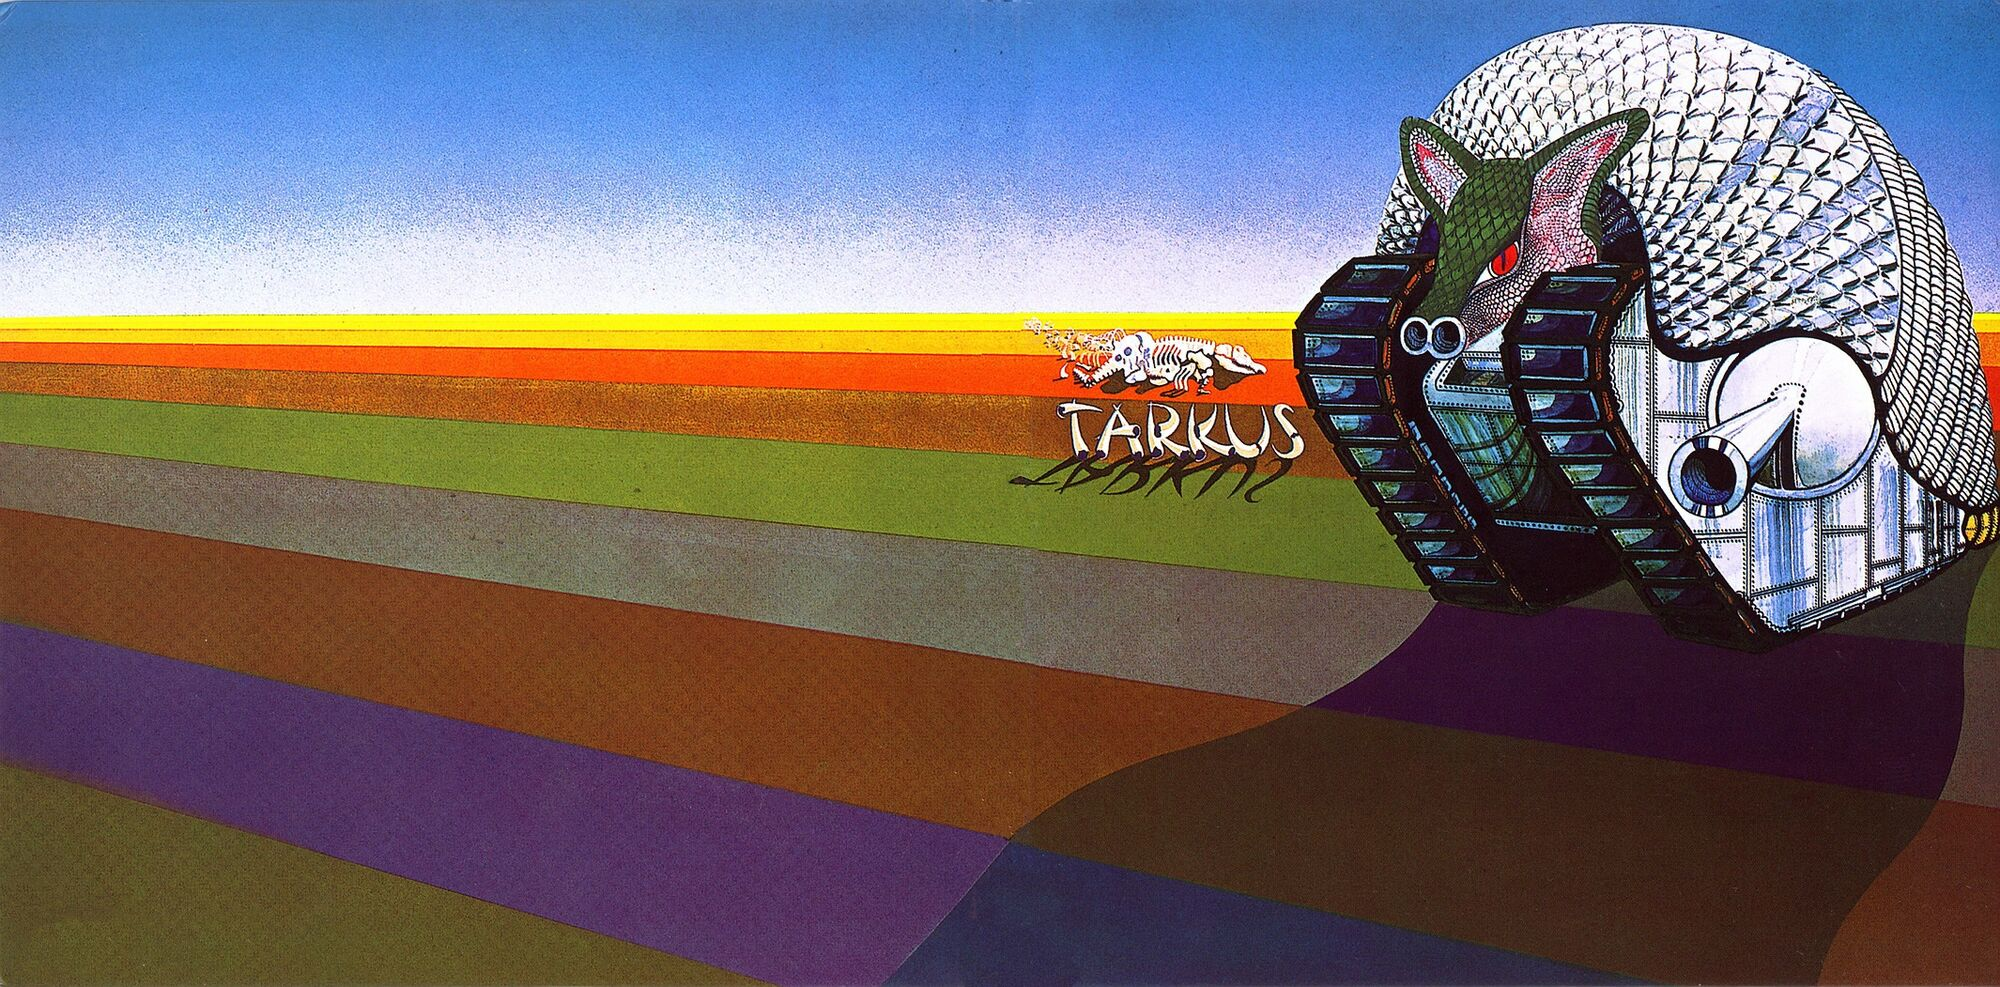 Image - Emerson Lake And Palmer Tarkus.jpg